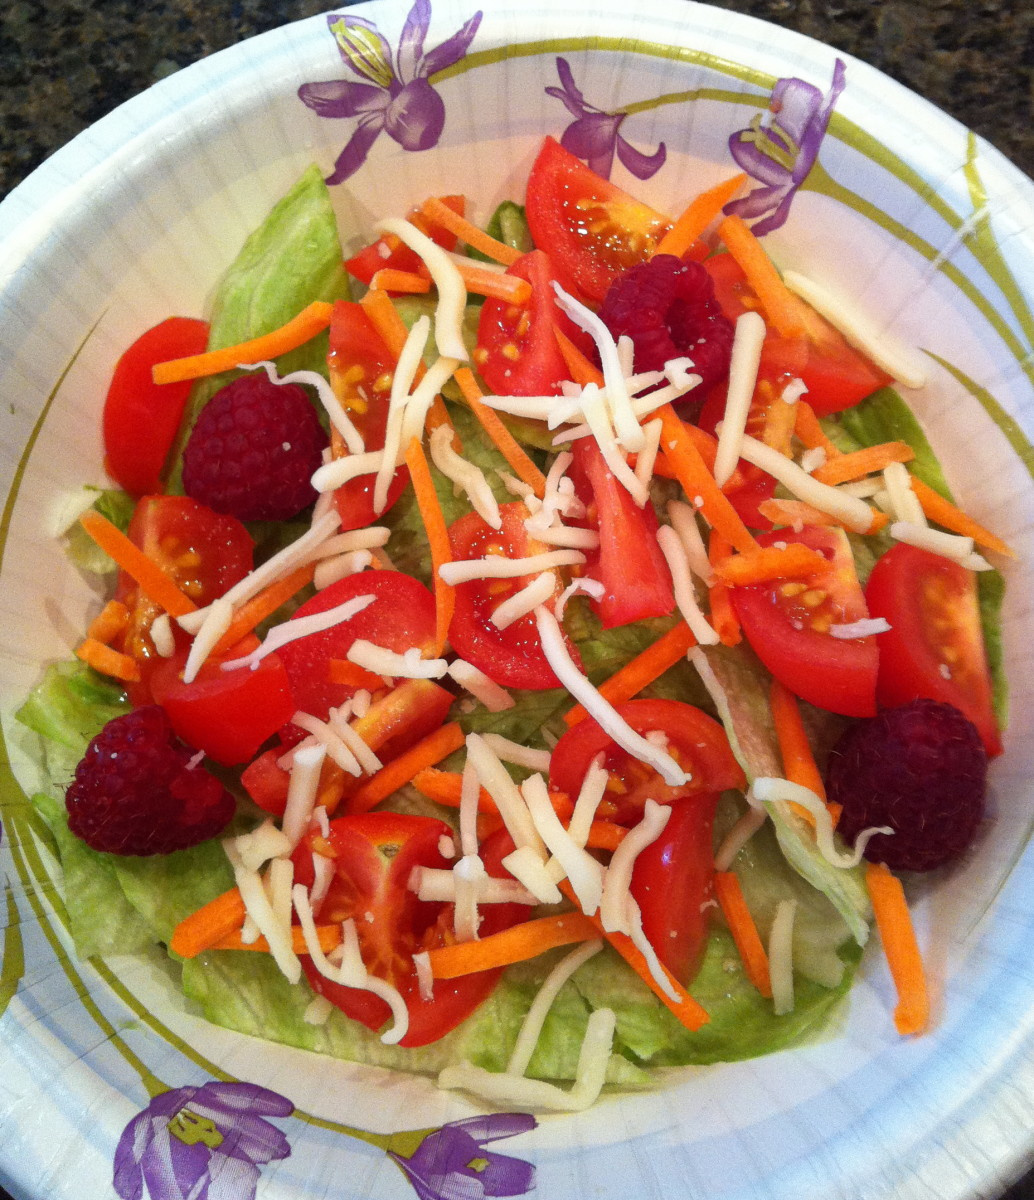 Raspberry and tomato salad